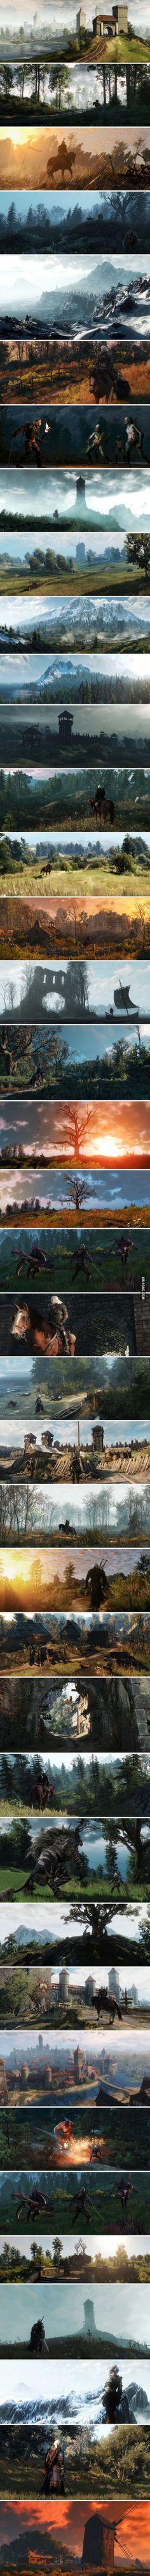 Stunningly Beautiful Witcher 3 Screenshots